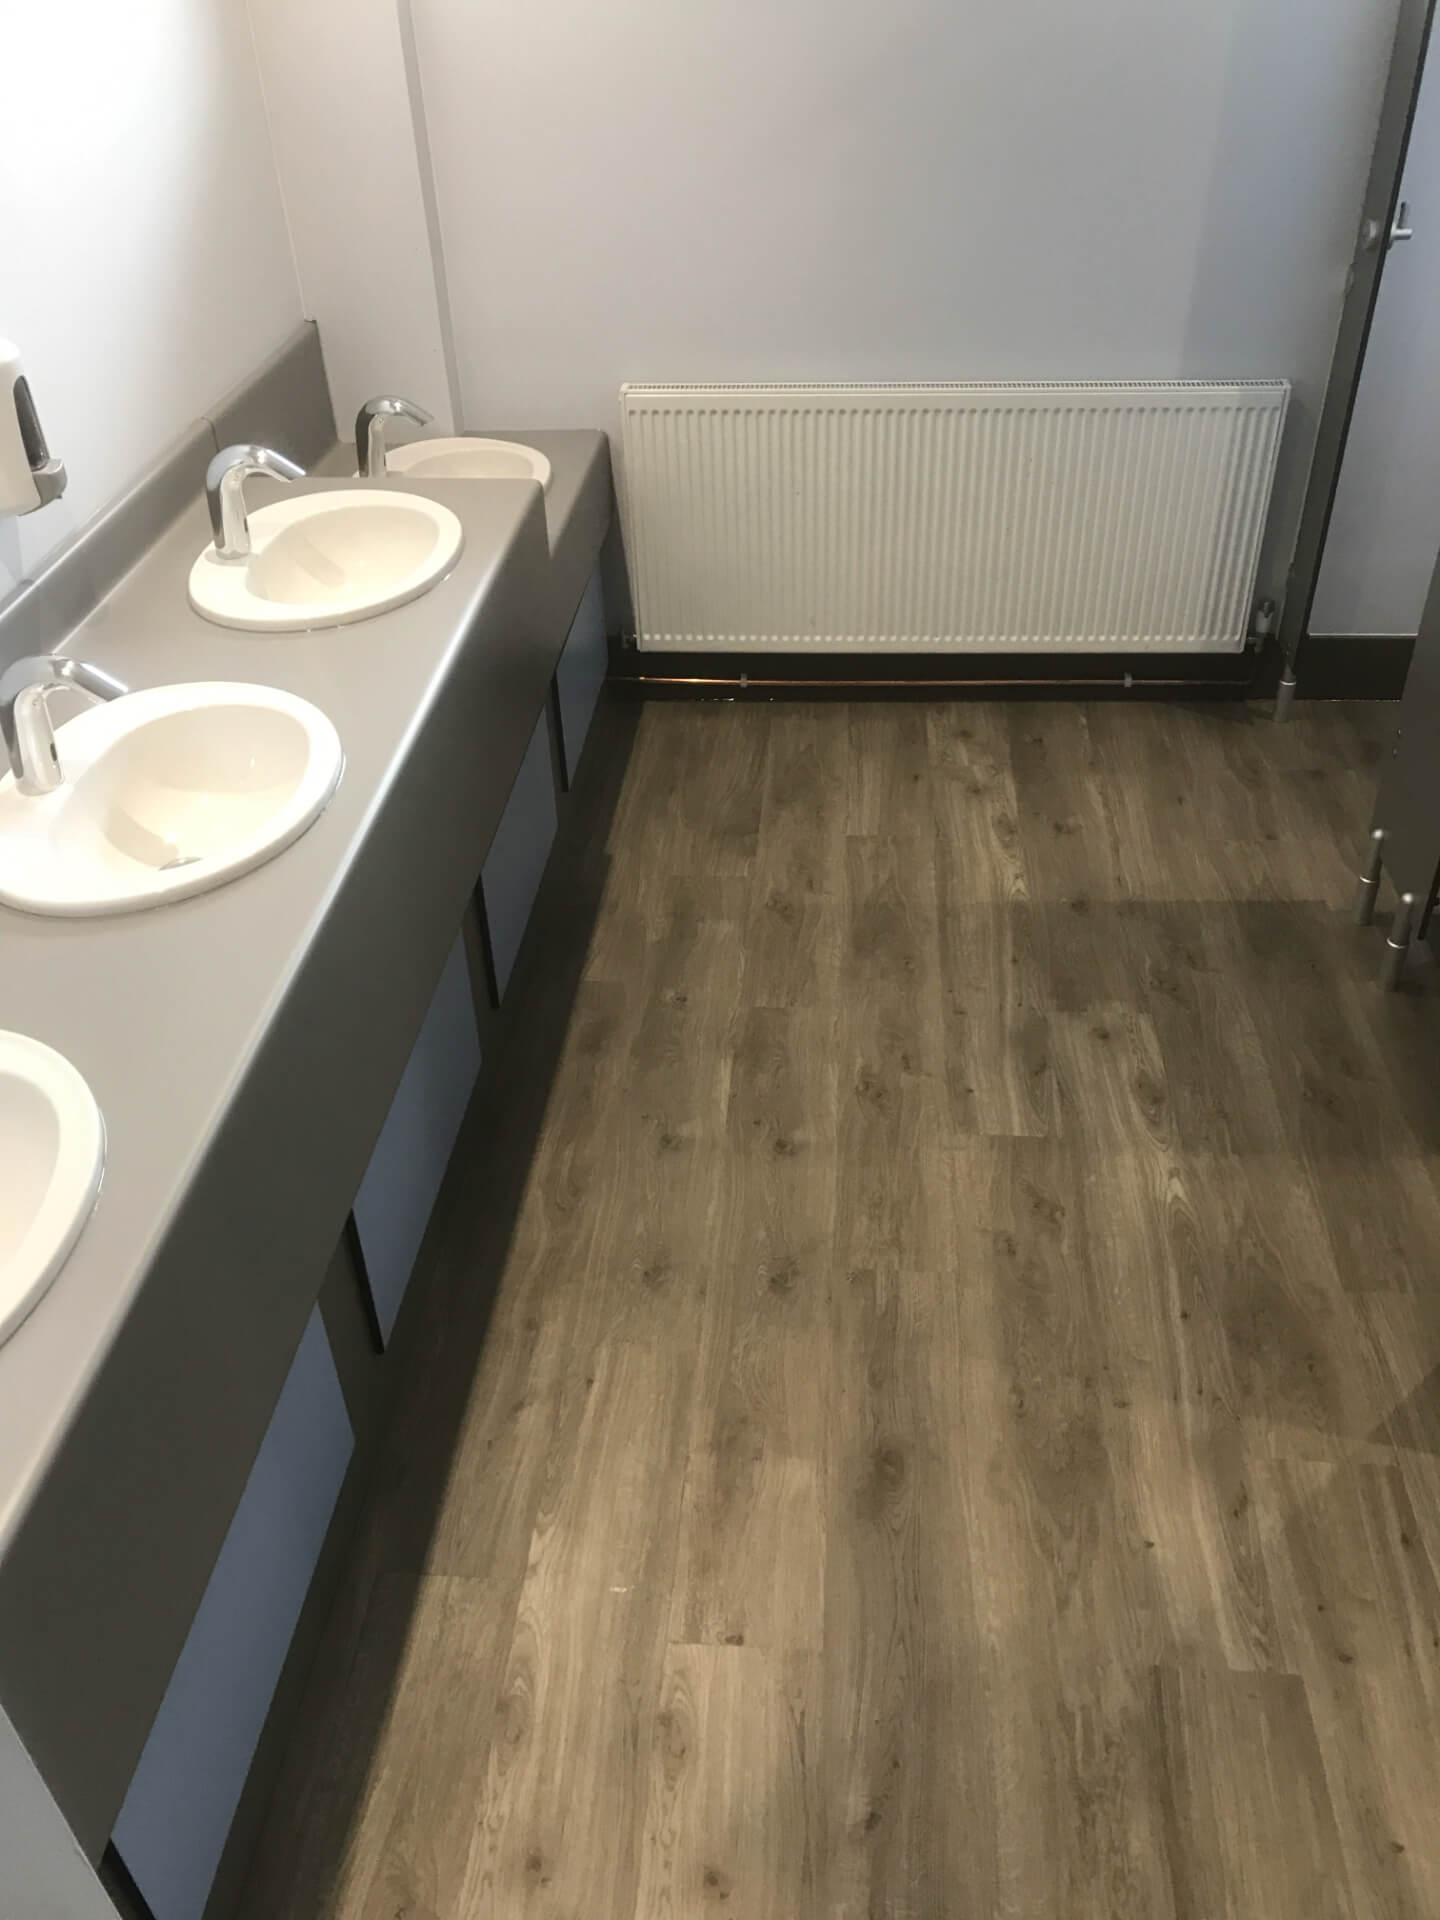 New Wooden Bathroom Flooring